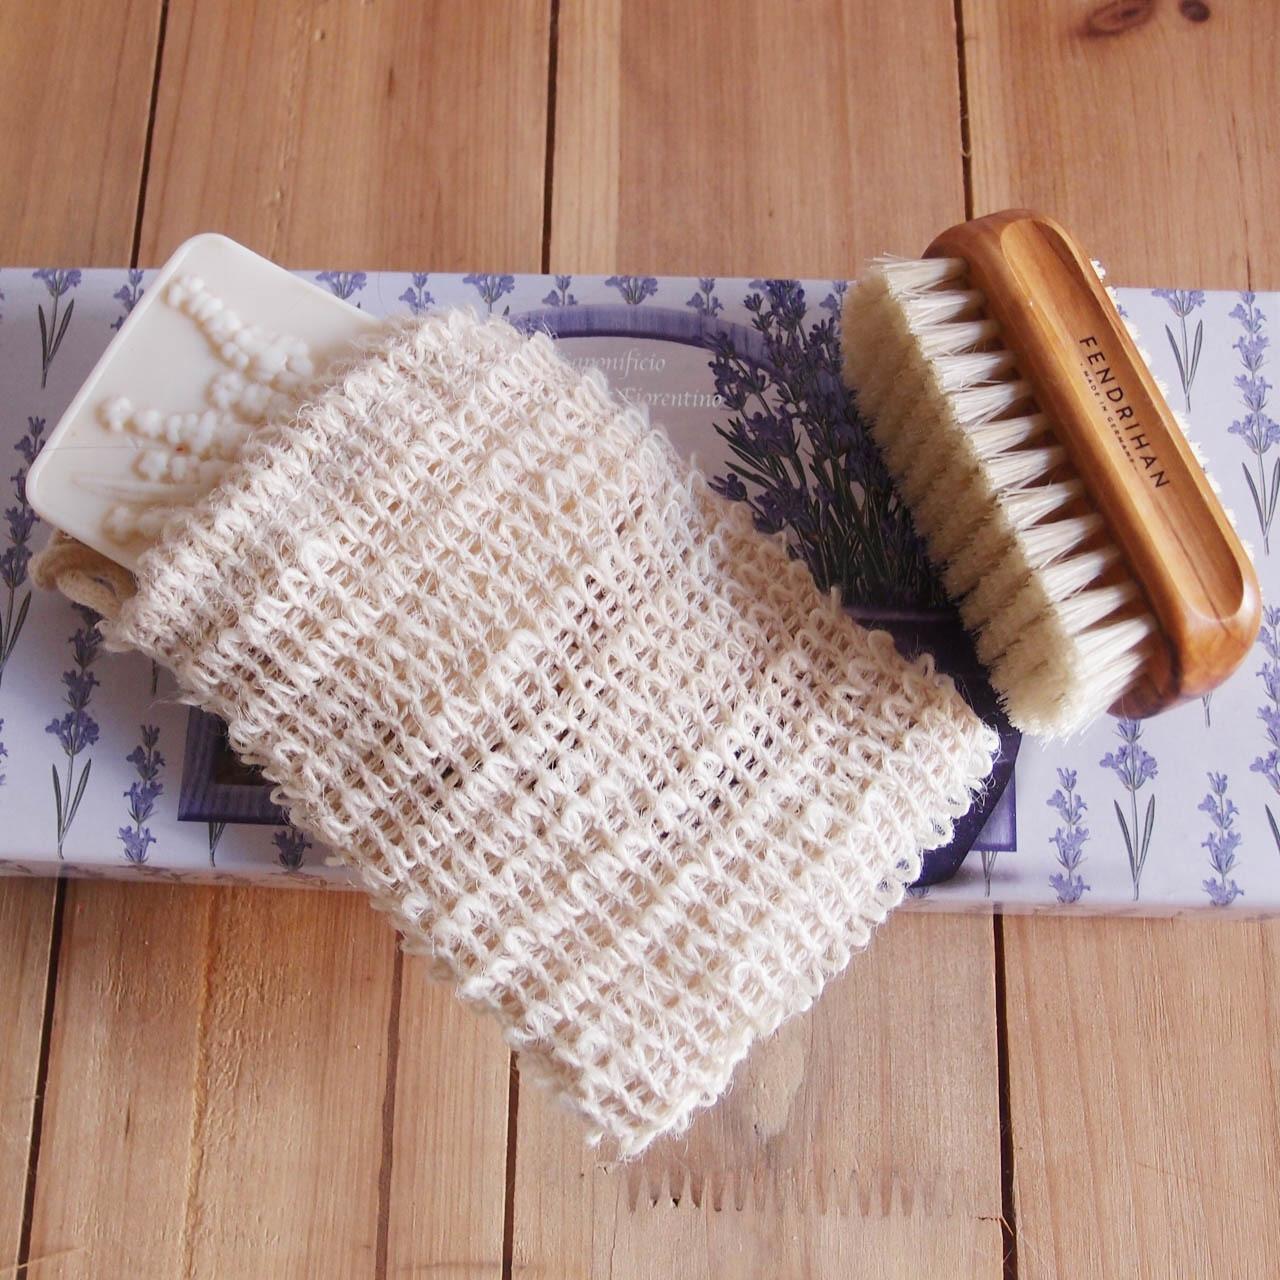 Sisal Soap Saver Scrub Bag B002-71, Wholesale Soap Saver Bags | Packaging Decor